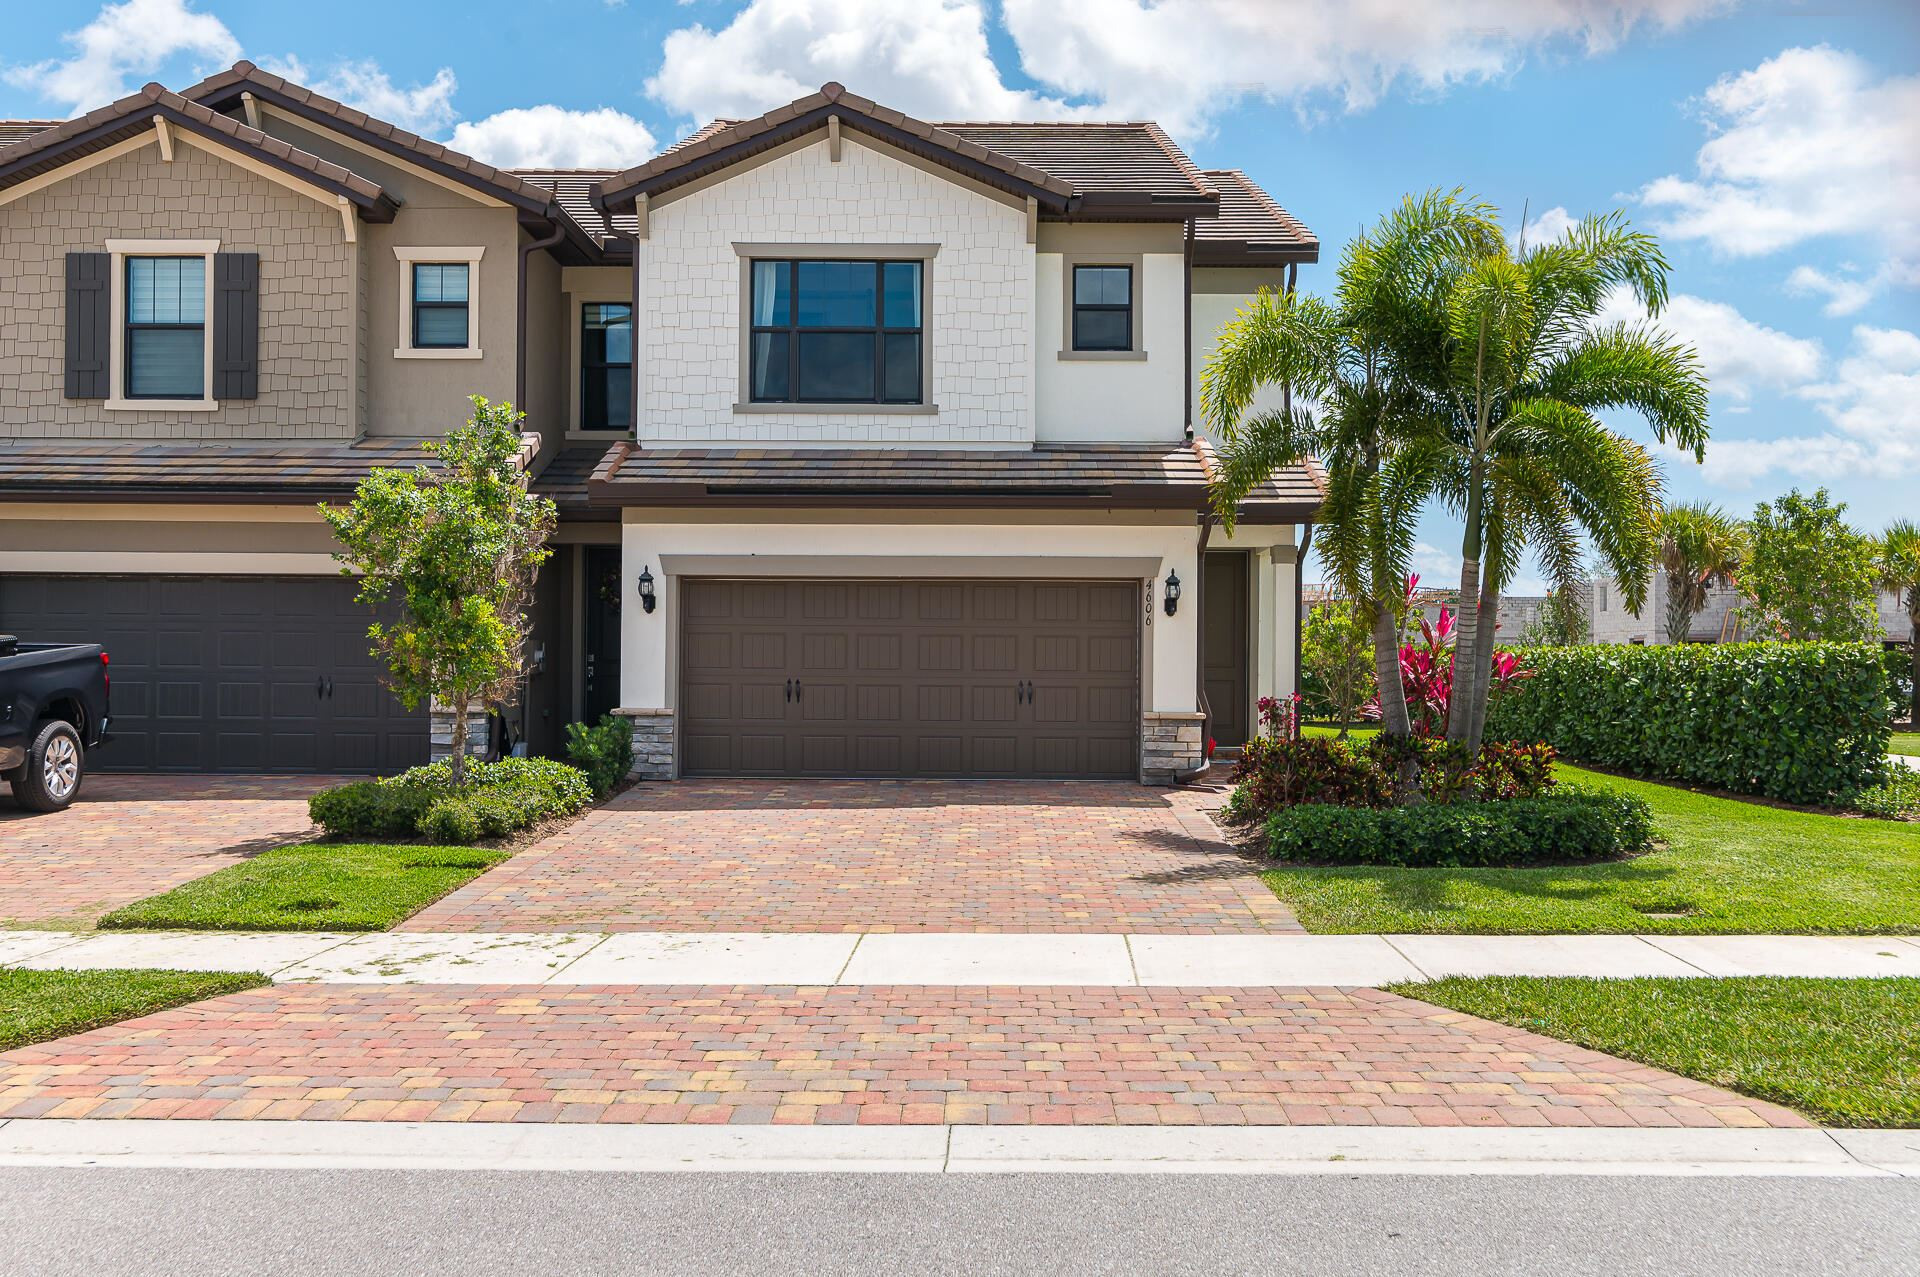 4606 San Fratello Circle, Lake Worth, FL 33467 - MLS#: RX-10713113